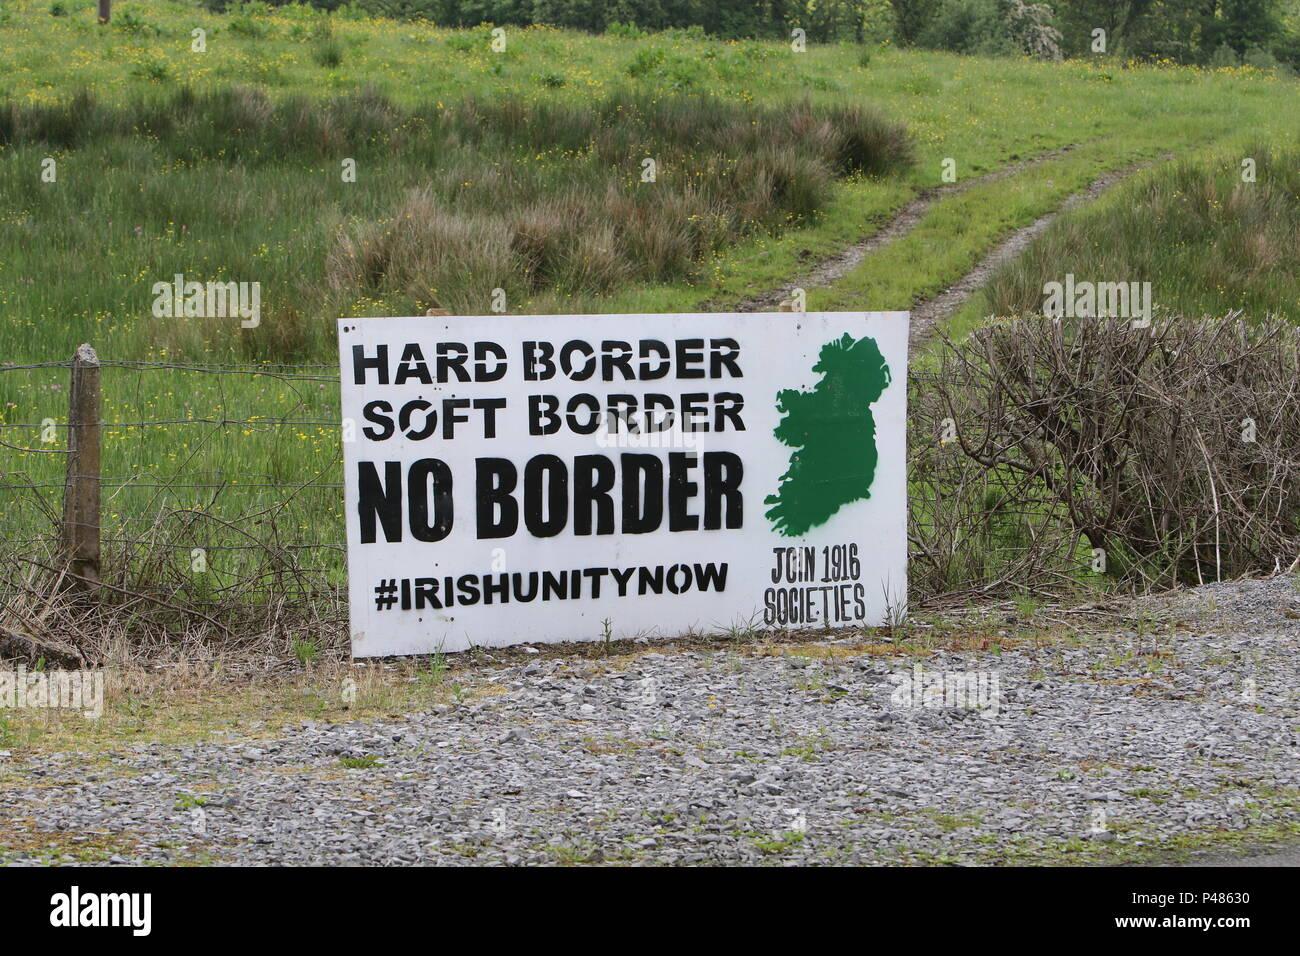 Ireland, UK, 2 June 2018. Irish Unity Hard Soft No Border sign at edge of road near Irish border and important to ongoing Brexit negotiations. - Stock Image